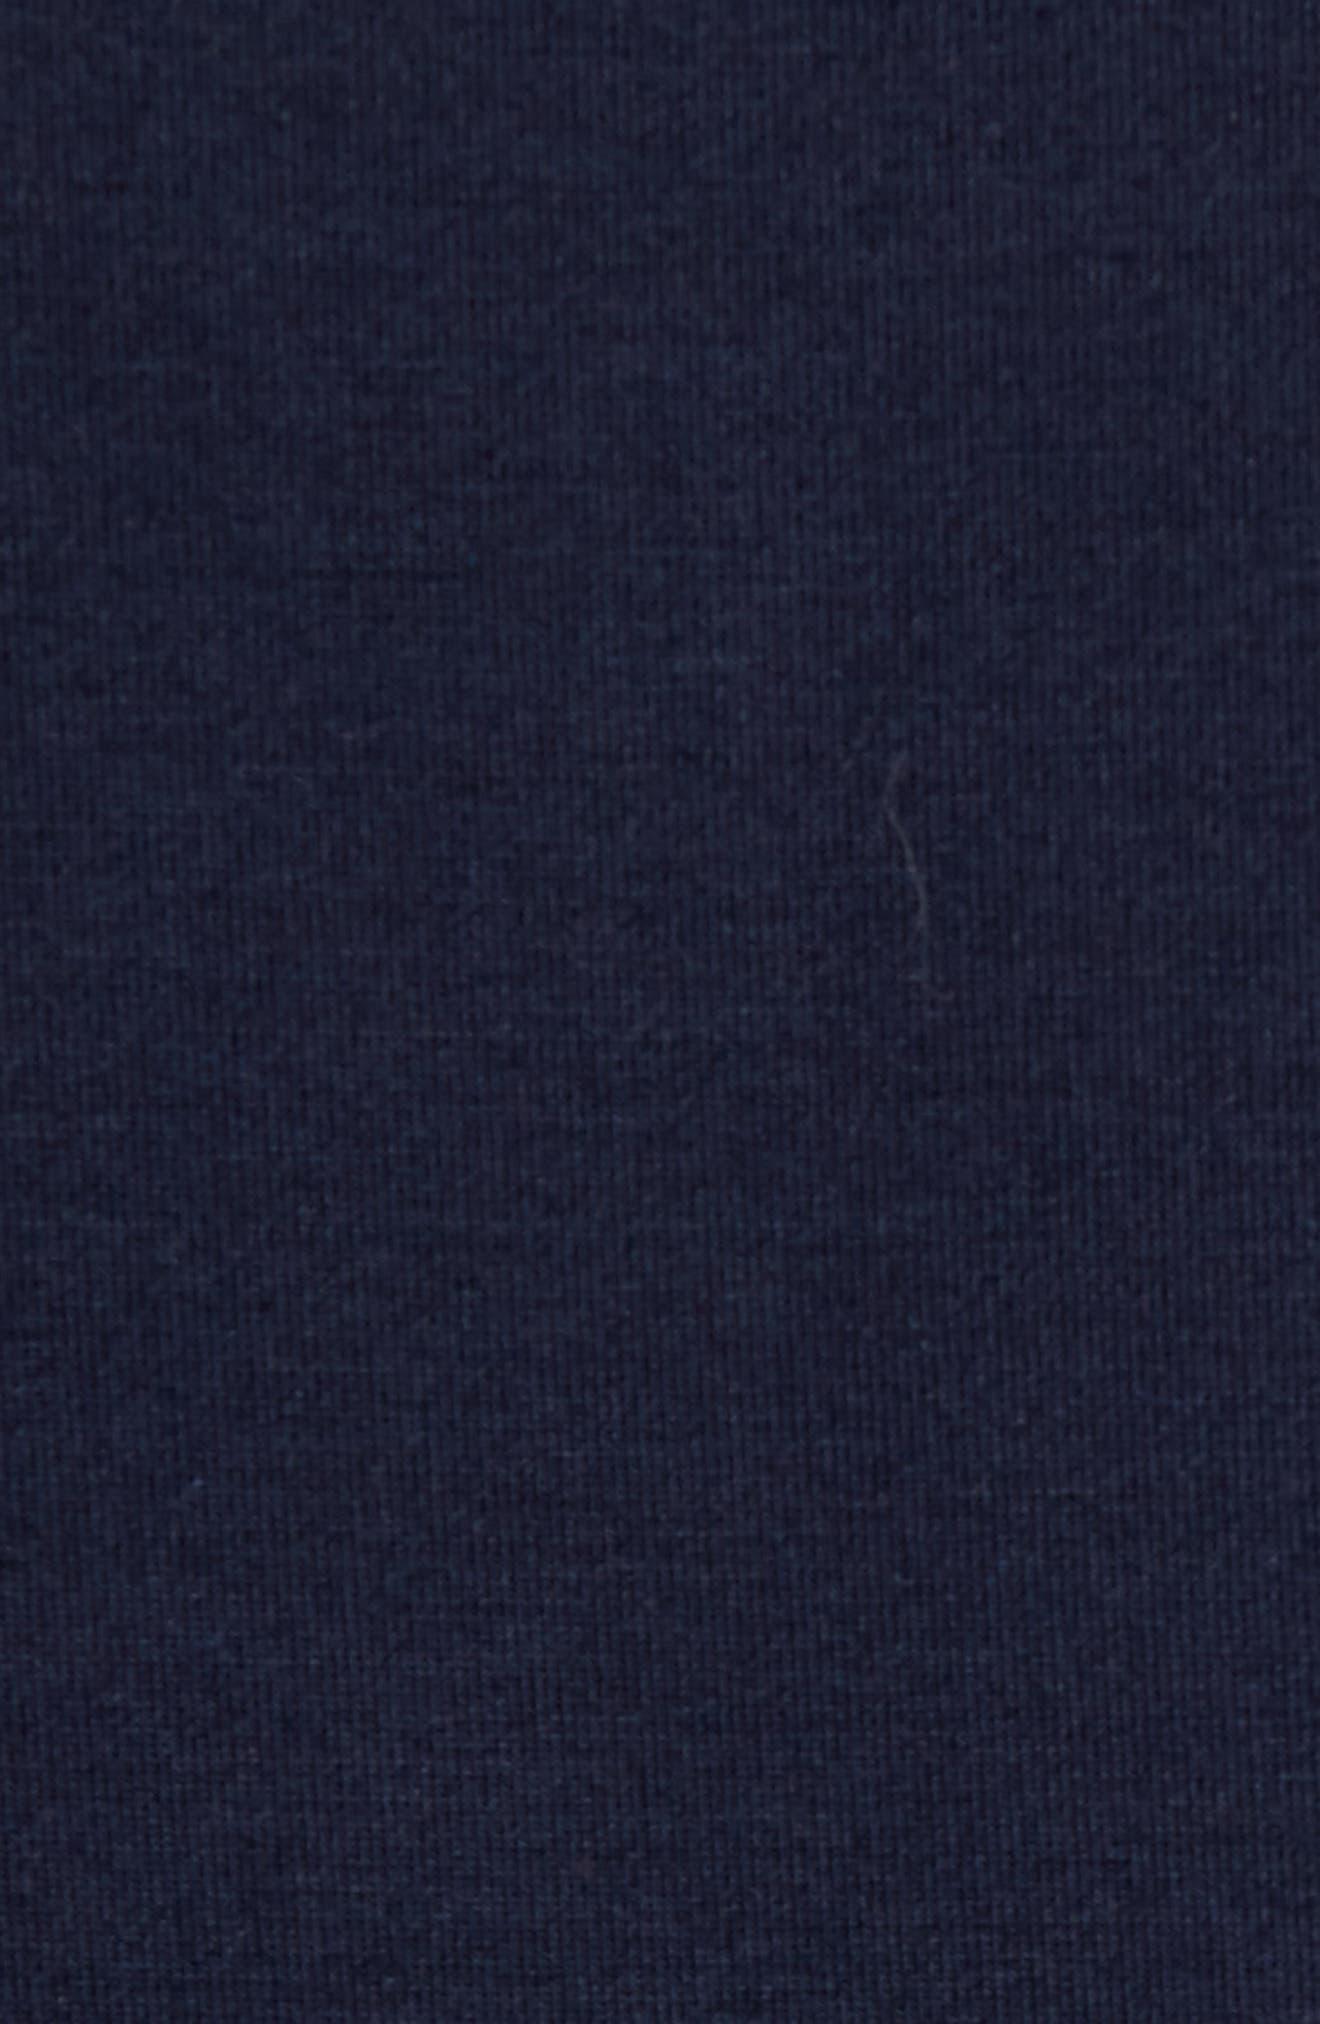 Modal Blend Henley T-shirt,                             Alternate thumbnail 5, color,                             INK